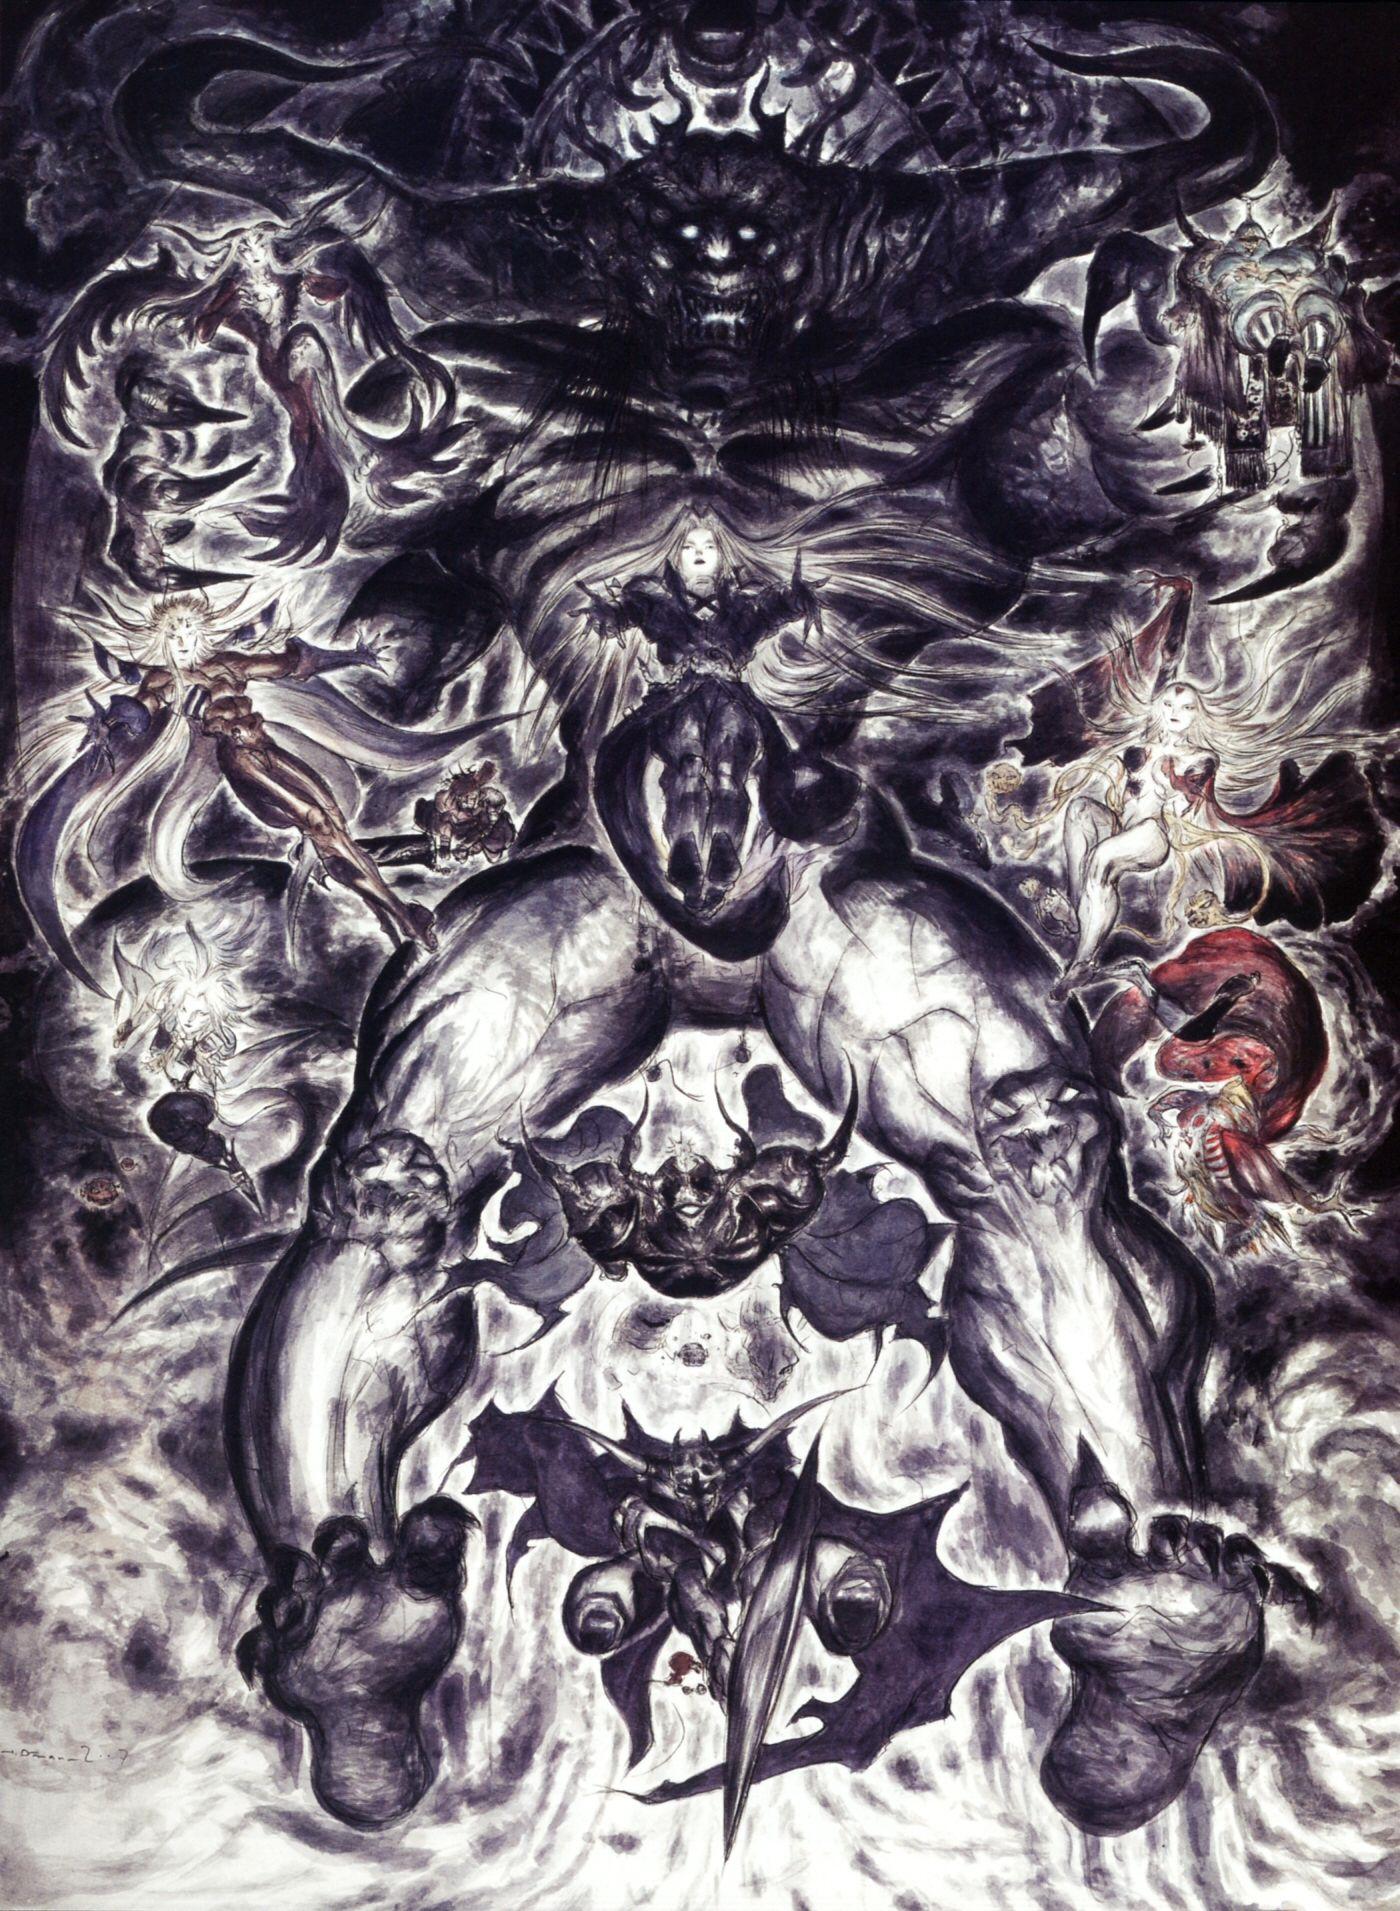 High School DxD: The Darkest Evil Cometh